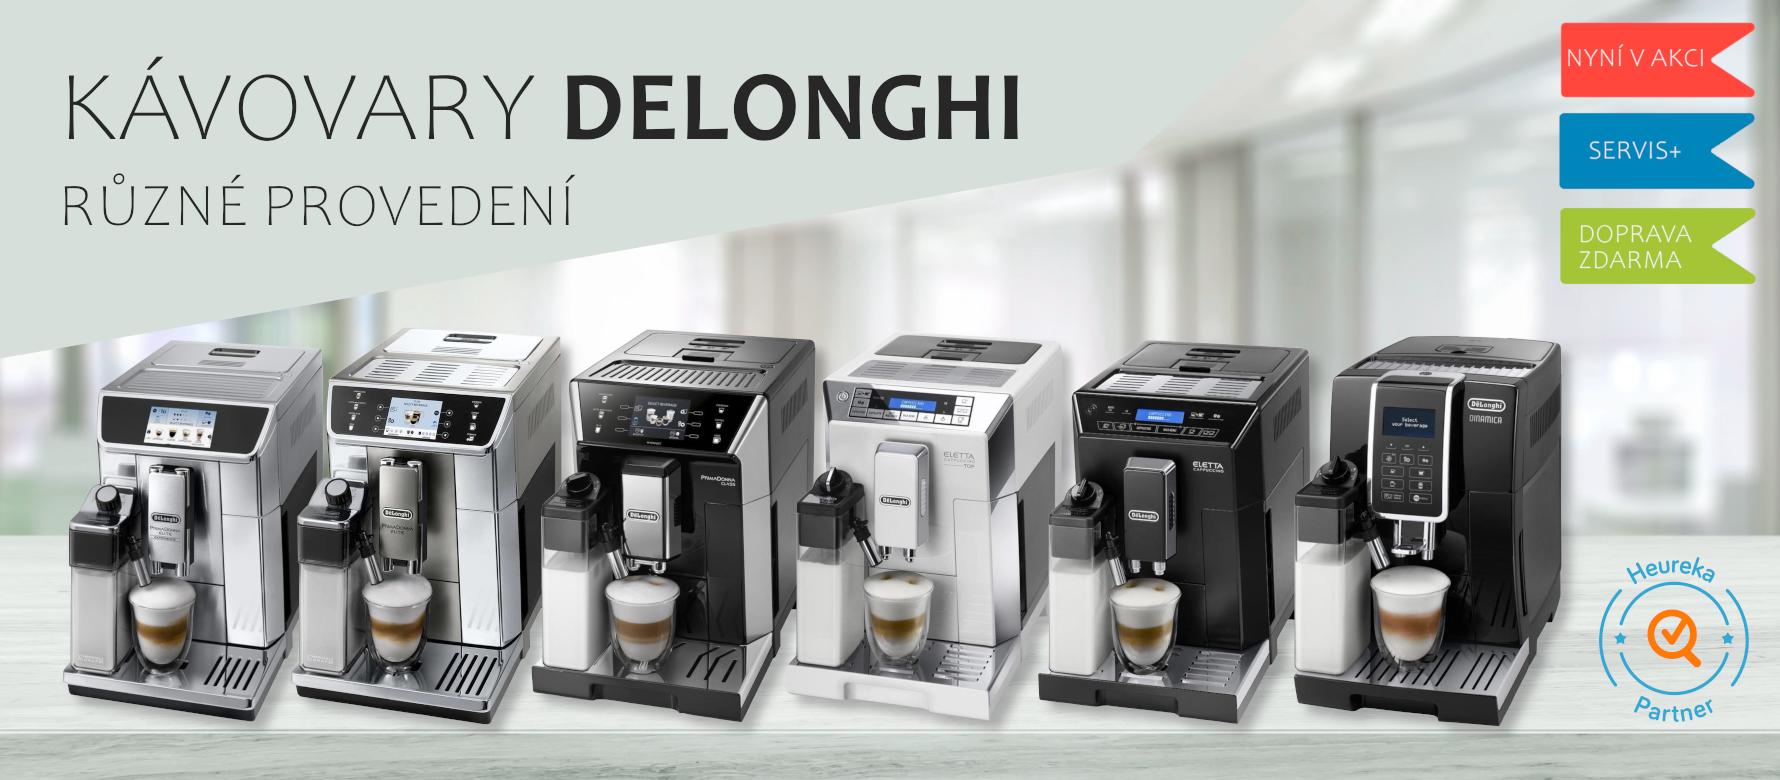 DeLonghi coffee